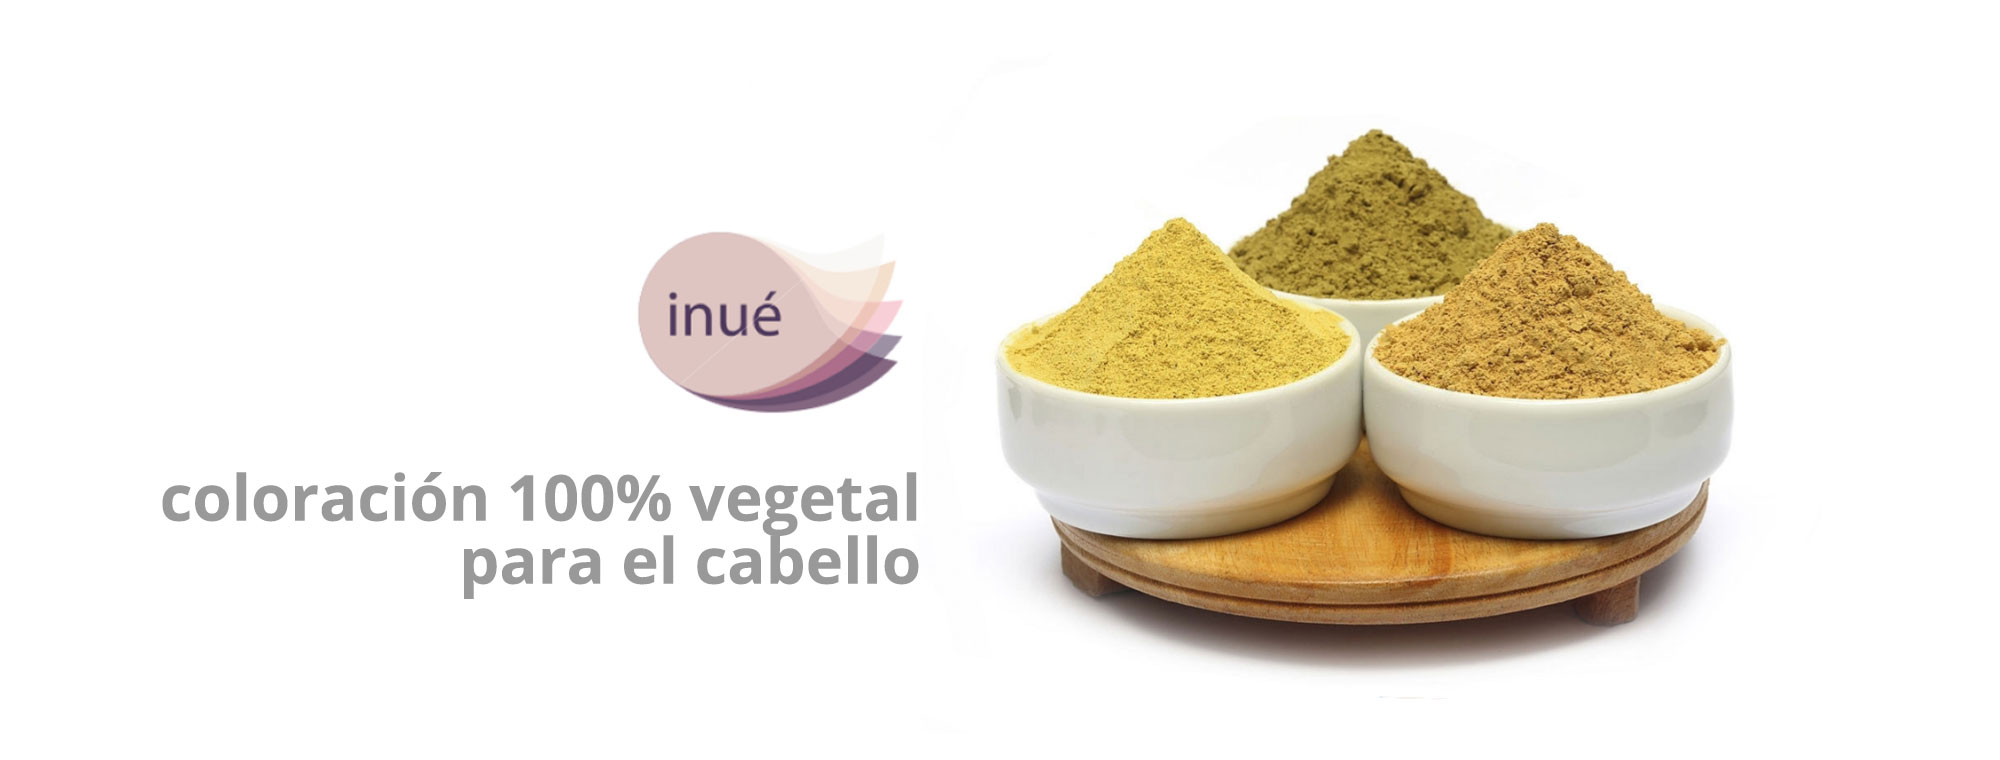 The Inué Concept